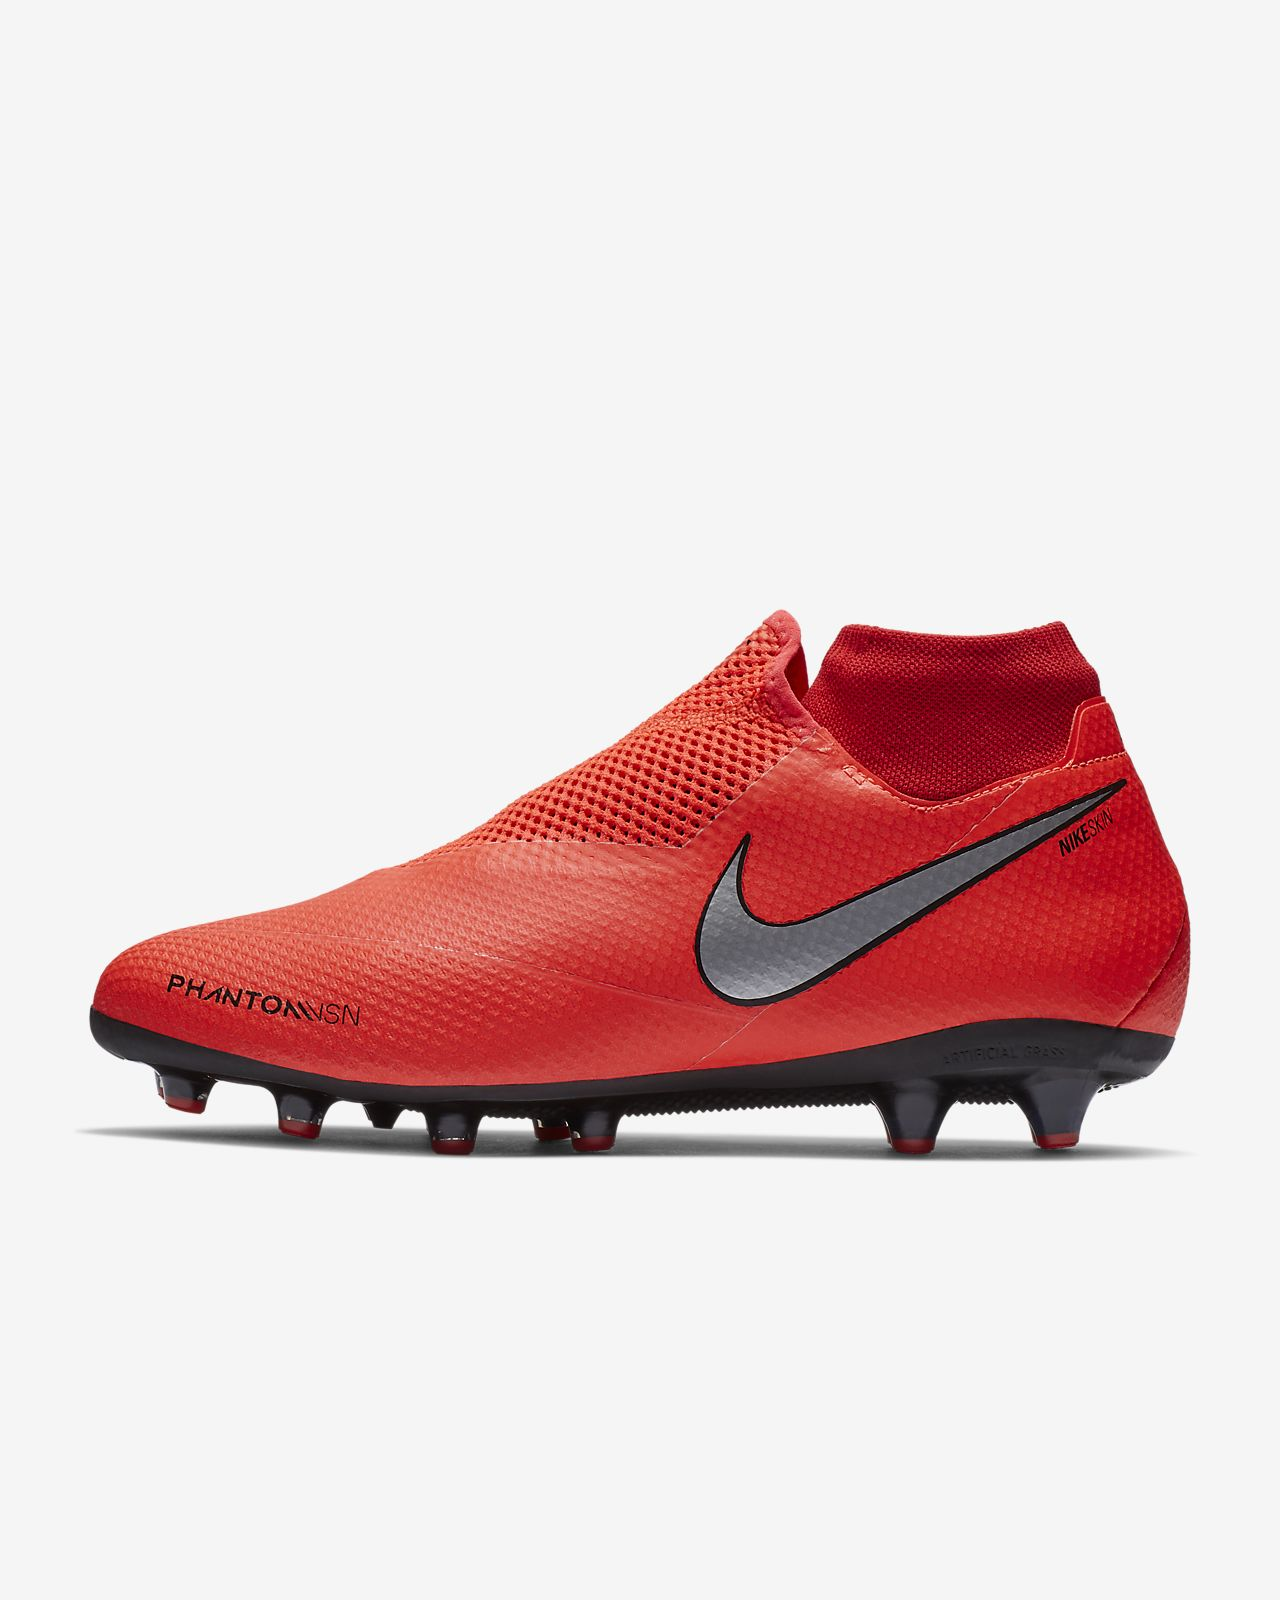 Calzado de fútbol para pasto artificial Nike Phantom Vision Pro Dynamic Fit  AG-PRO bfd655b17ef65